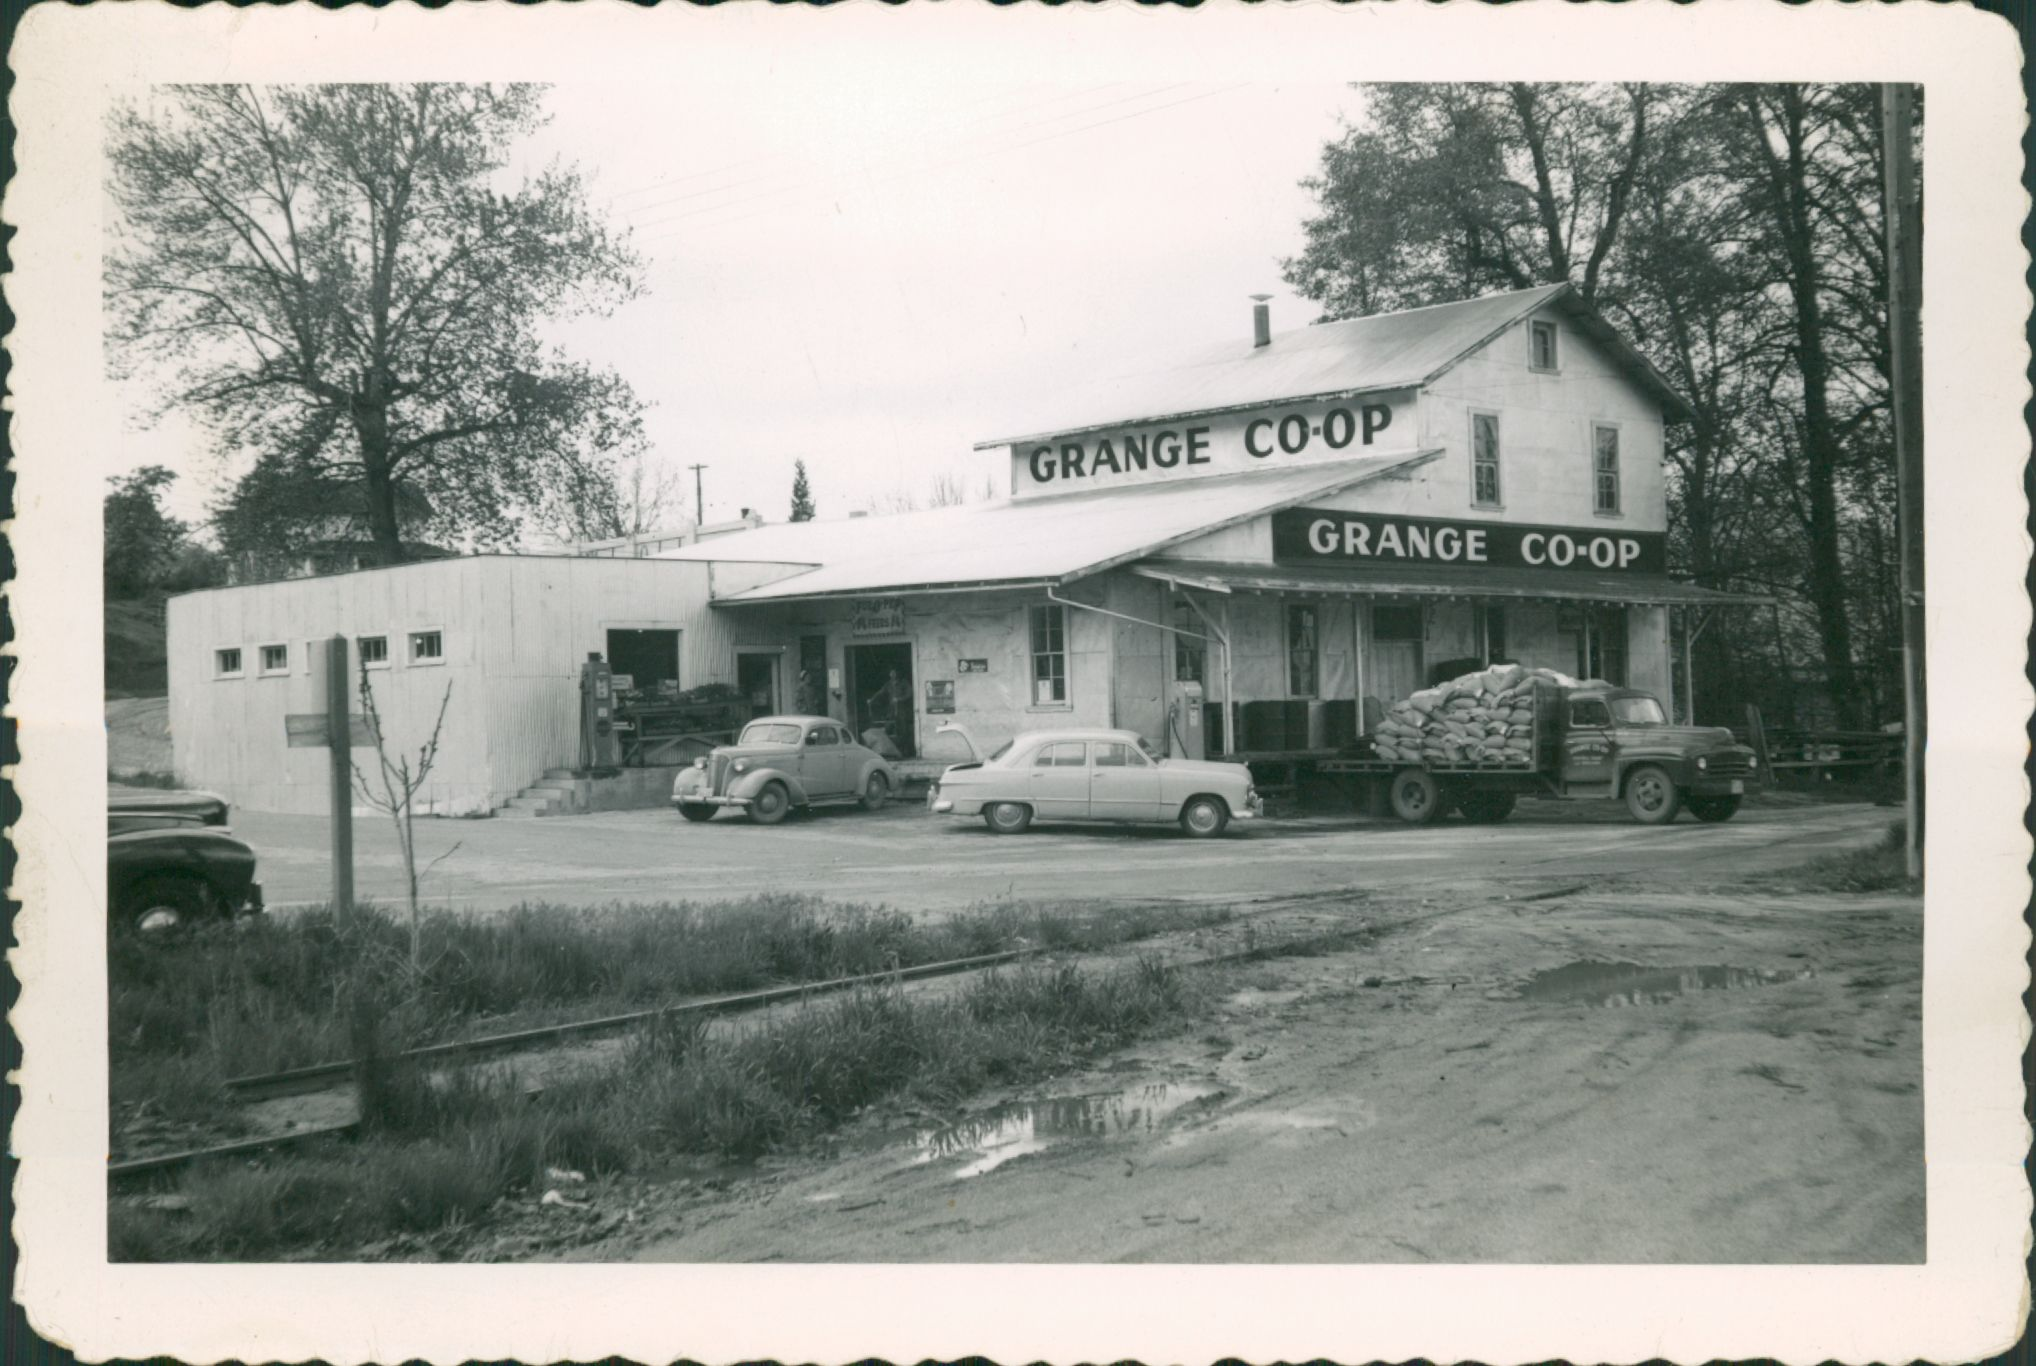 Grange Coop in original Ashland location on Water Street